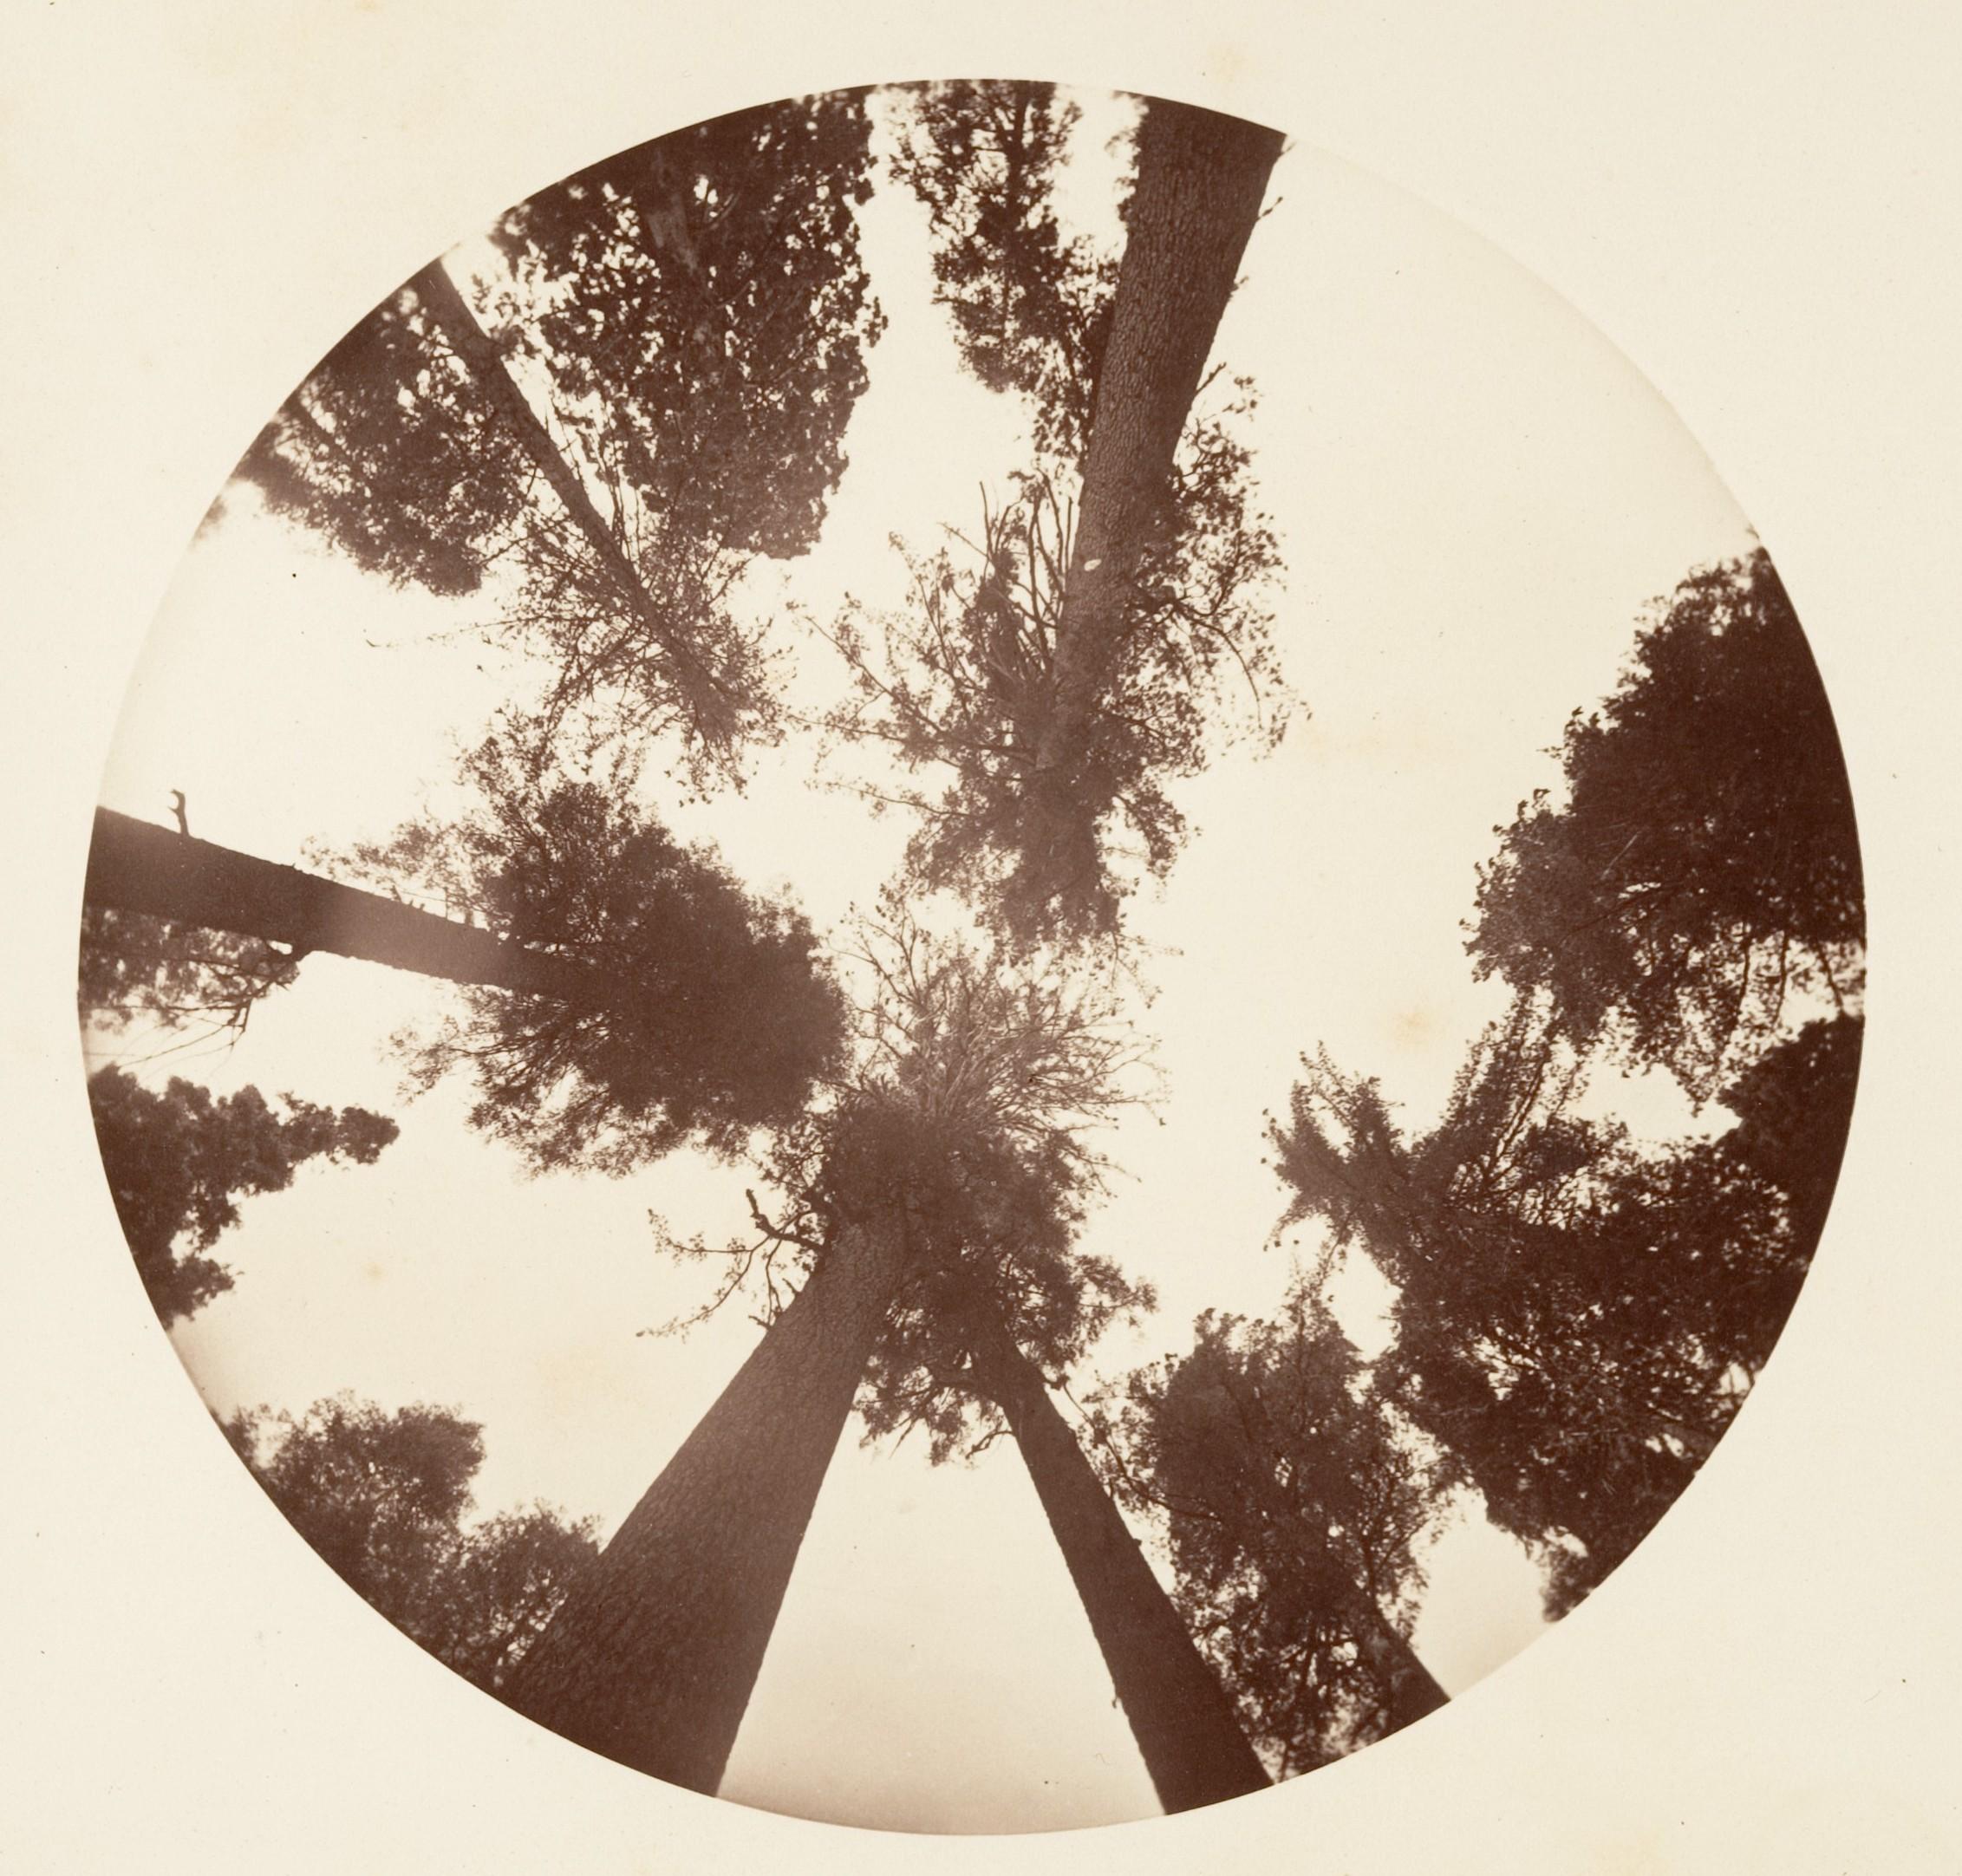 Fotó: Carleton Watkins: Looking up Among the Sugar Pines - Calaveras Grove, ca. 1878 © Carleton Watkins / The Metropolitan Museum of Art